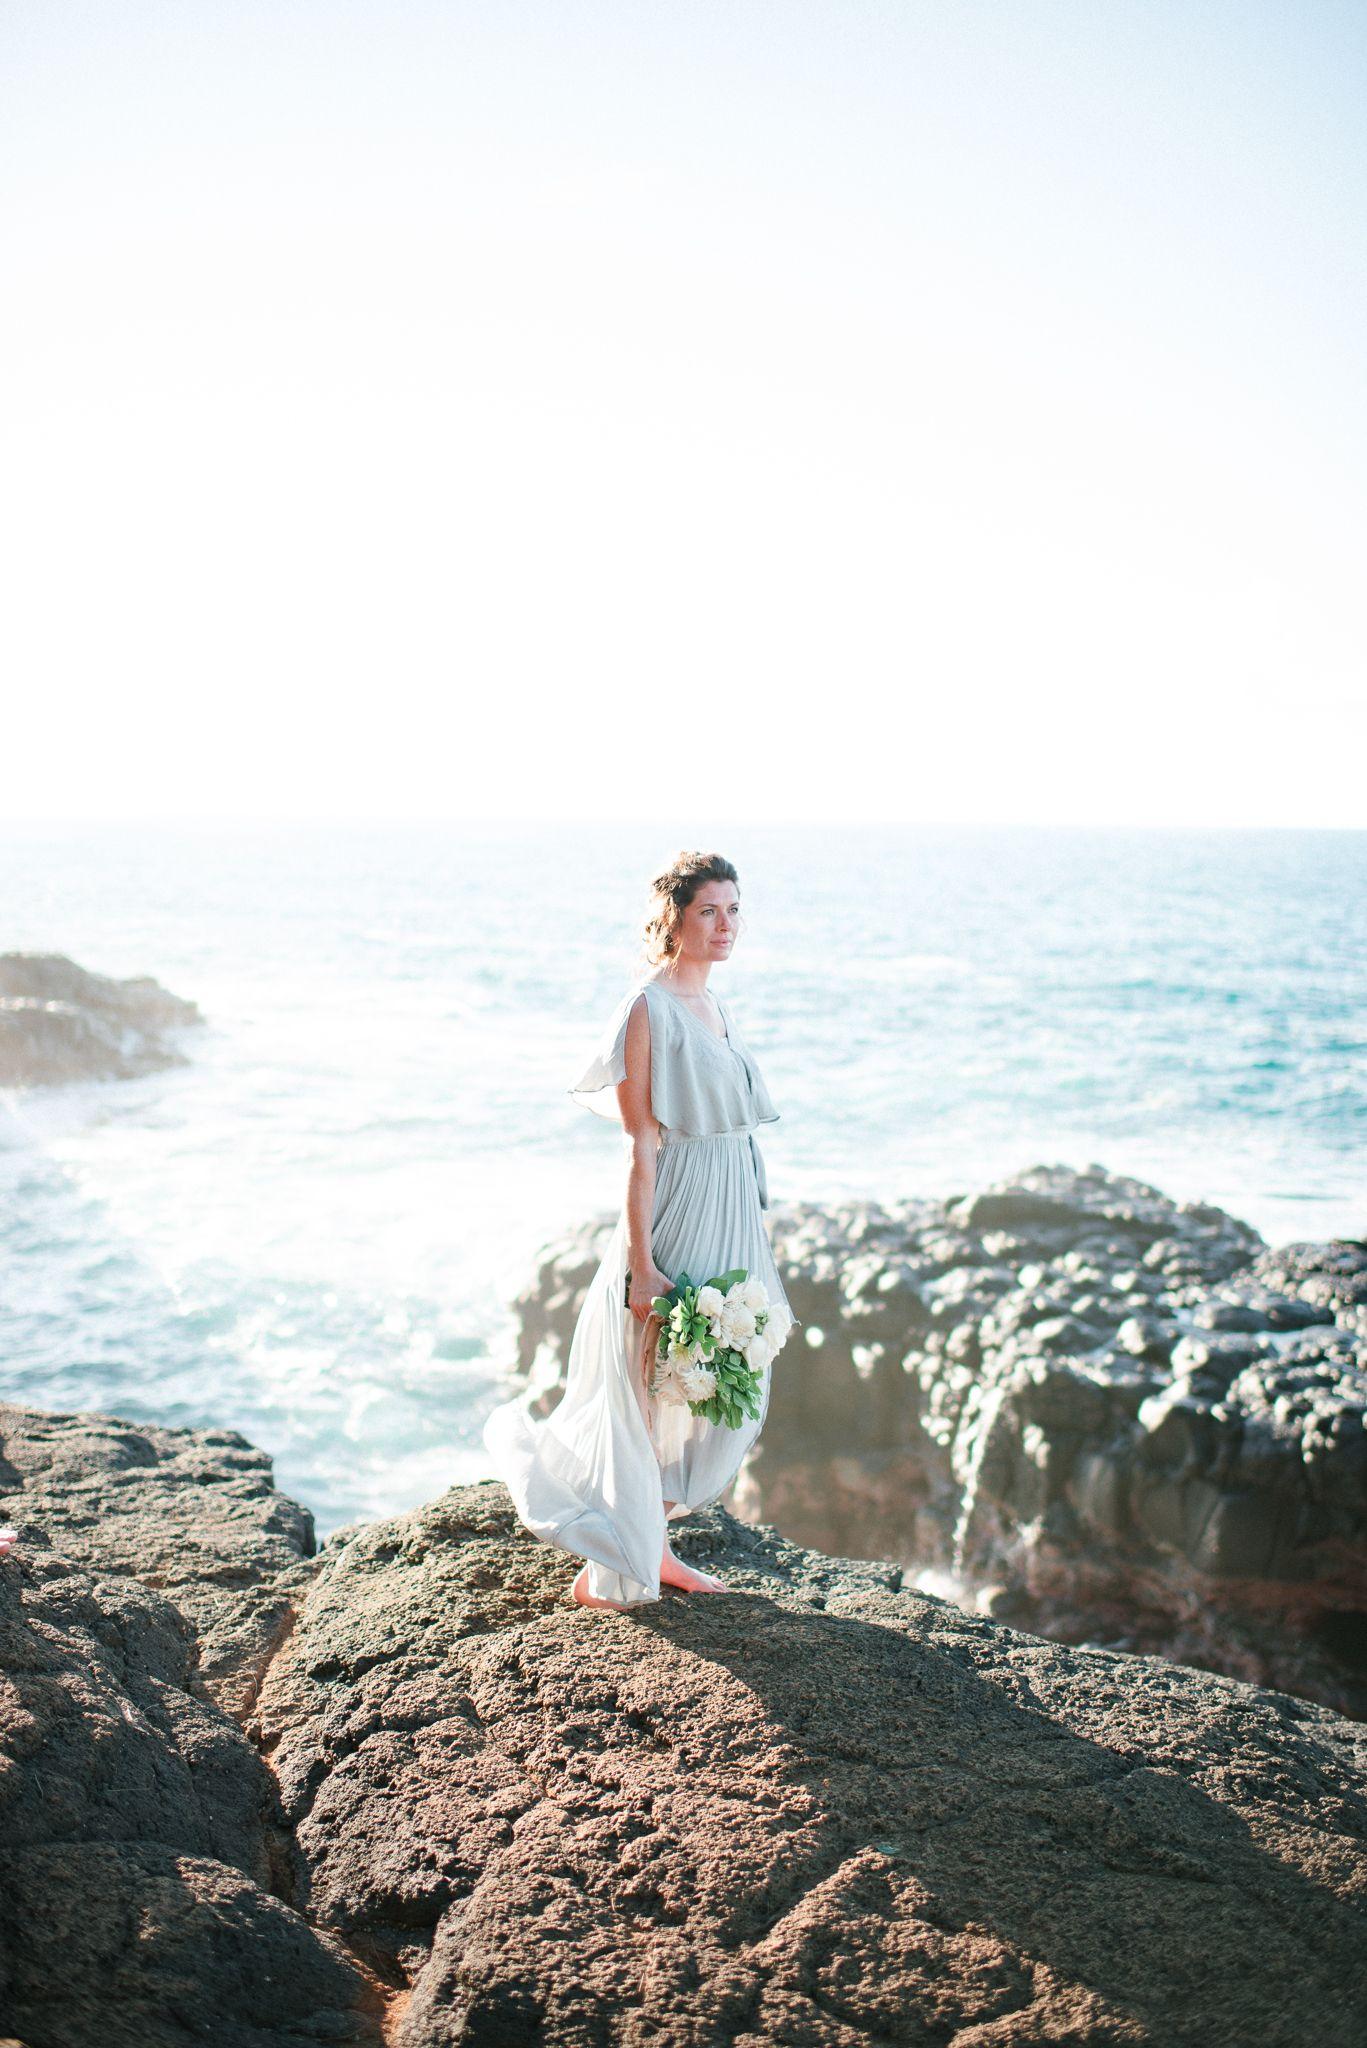 97203dce9b7c Queen's Bath Photoshoot, Kauai Engagement Photographer, Kauai Wedding  Photographer, Kauai Film Photographer,